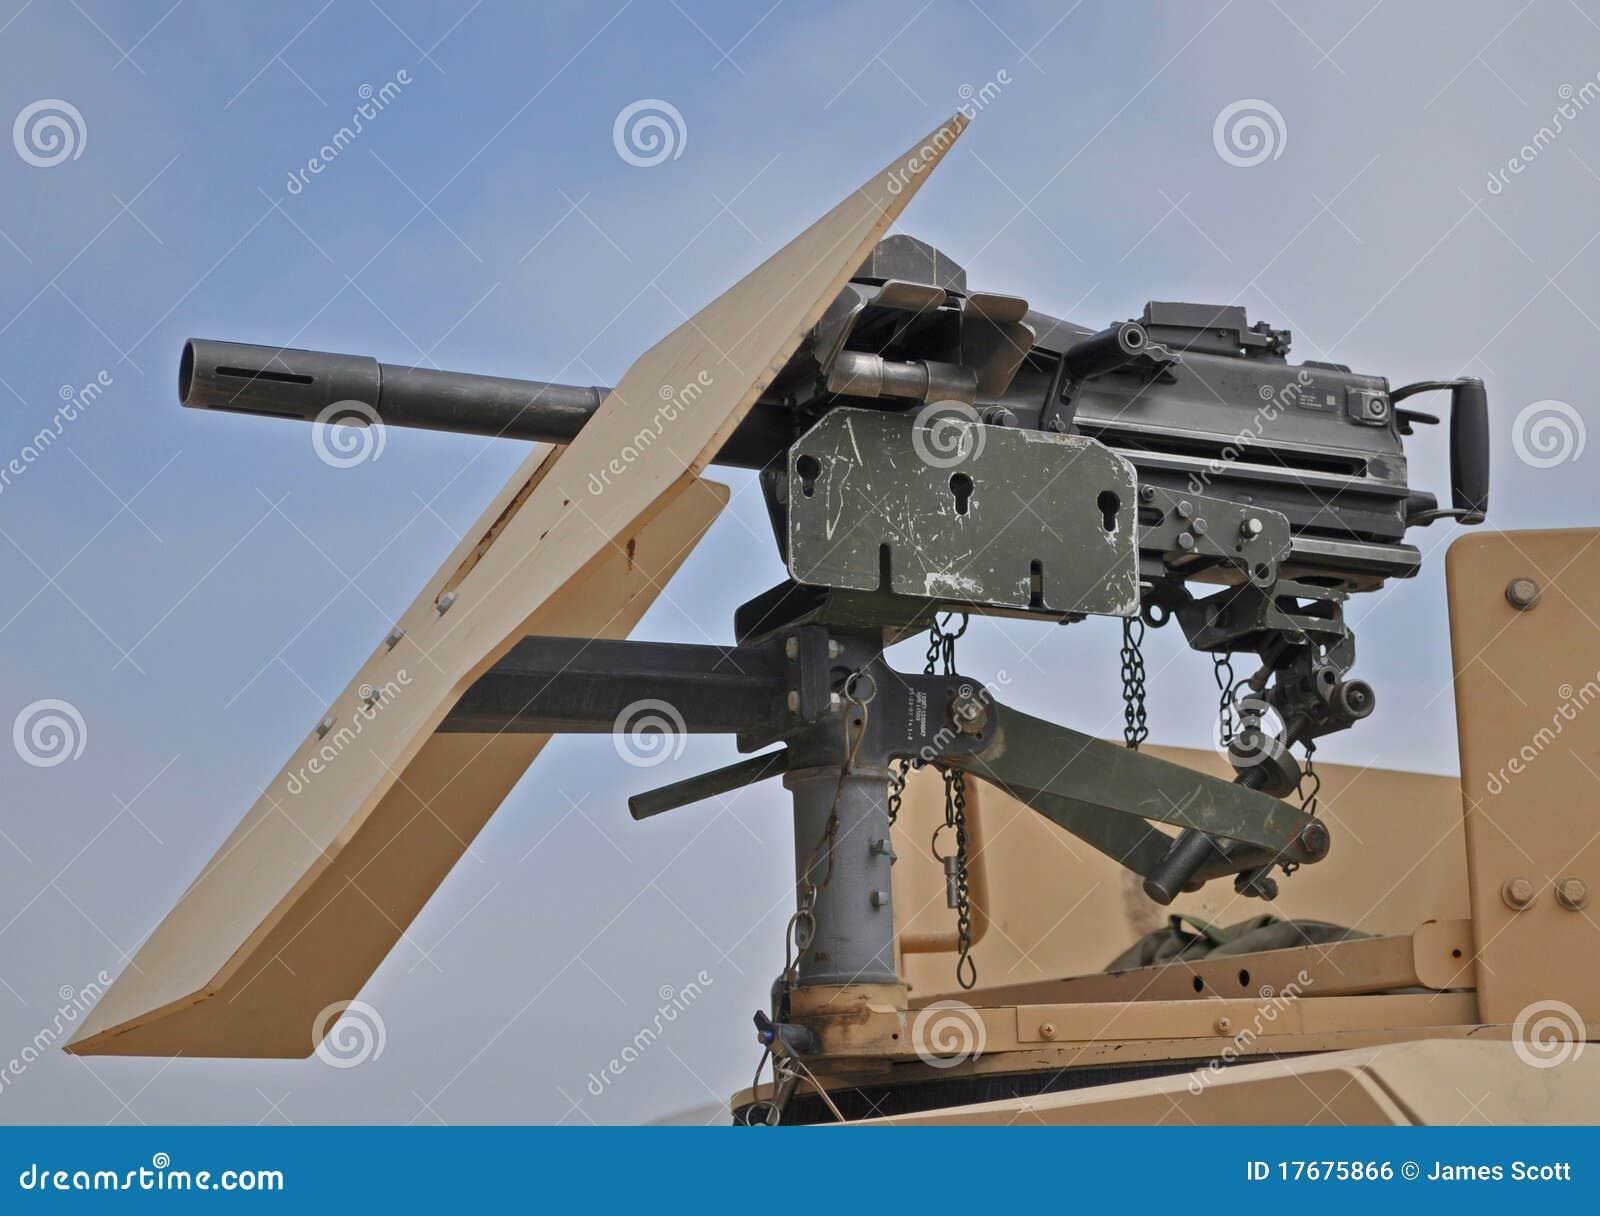 usmc-mk19-grenade-launcher-17675866.jpg